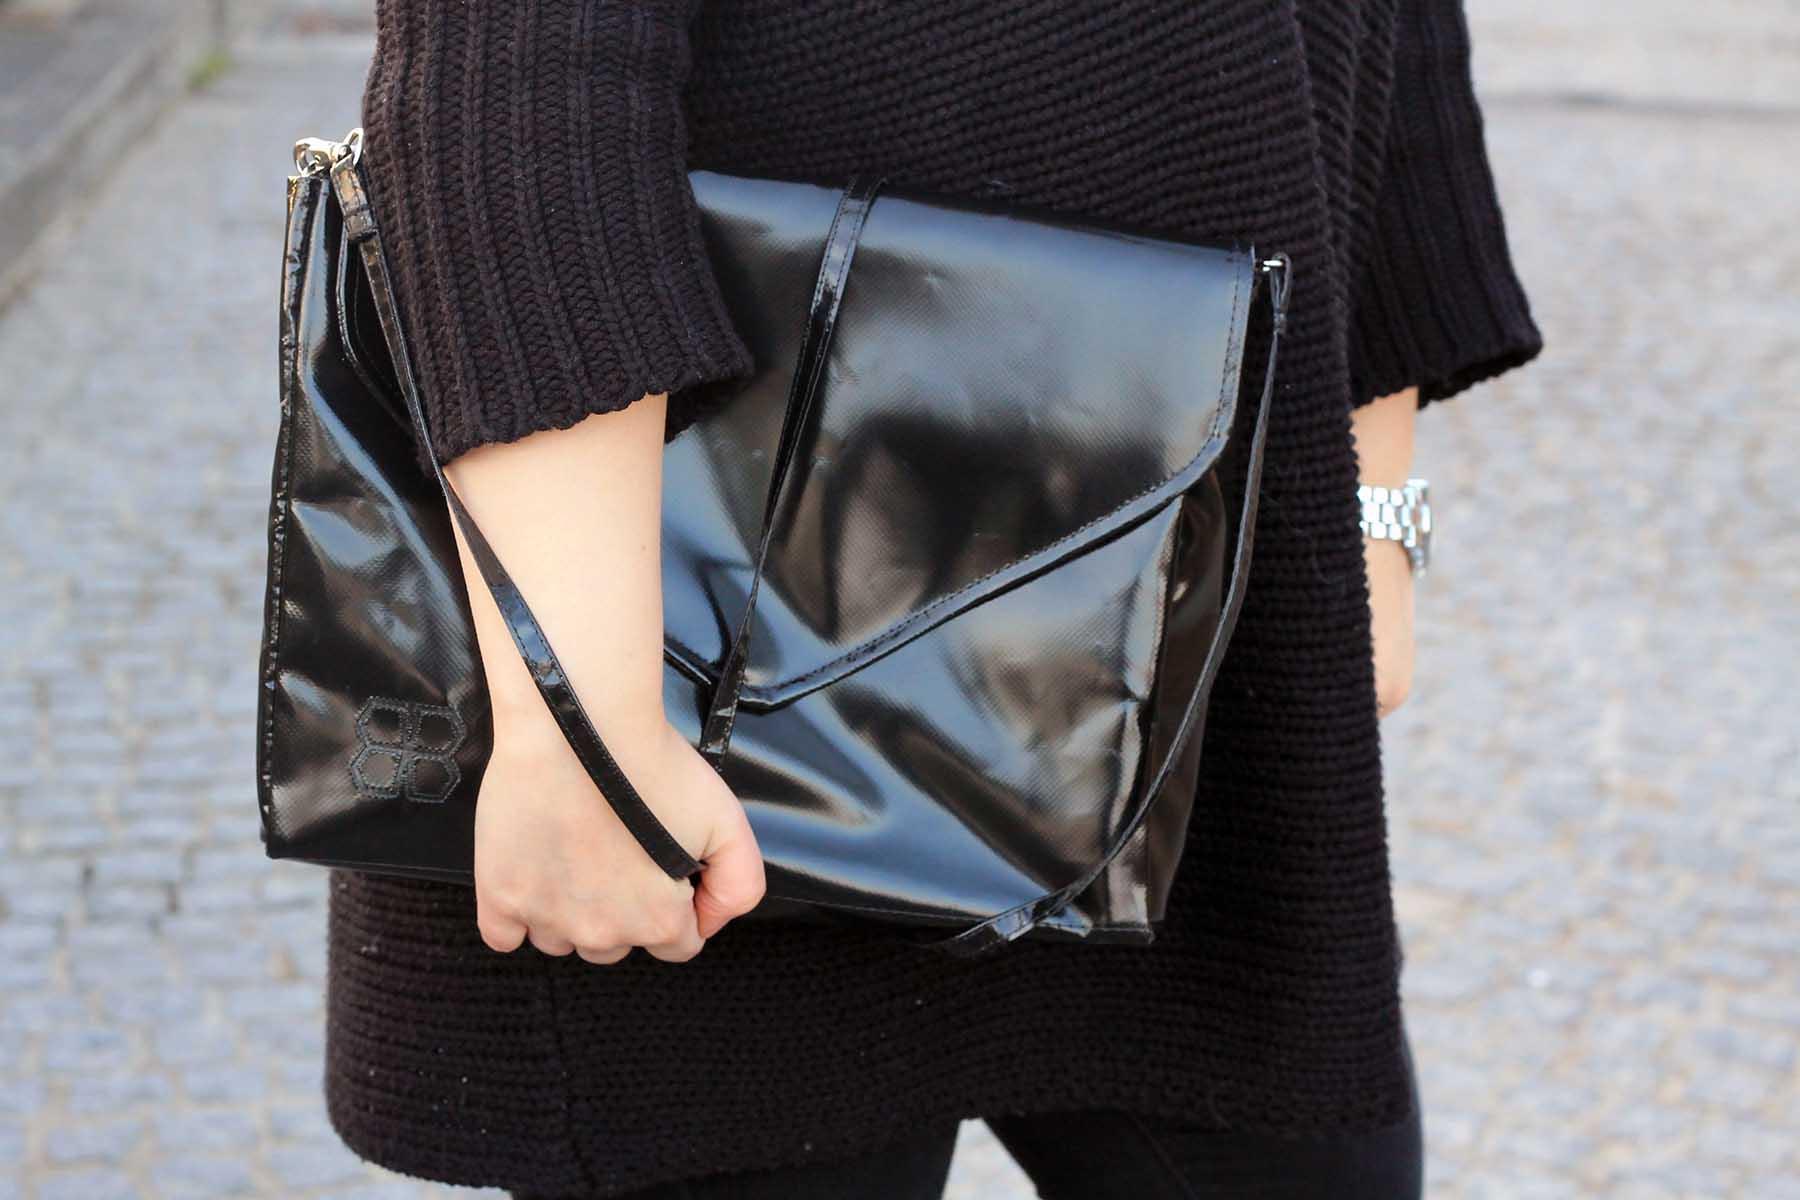 tasche-modeblog-fashionblog-berlin-hamburg-style